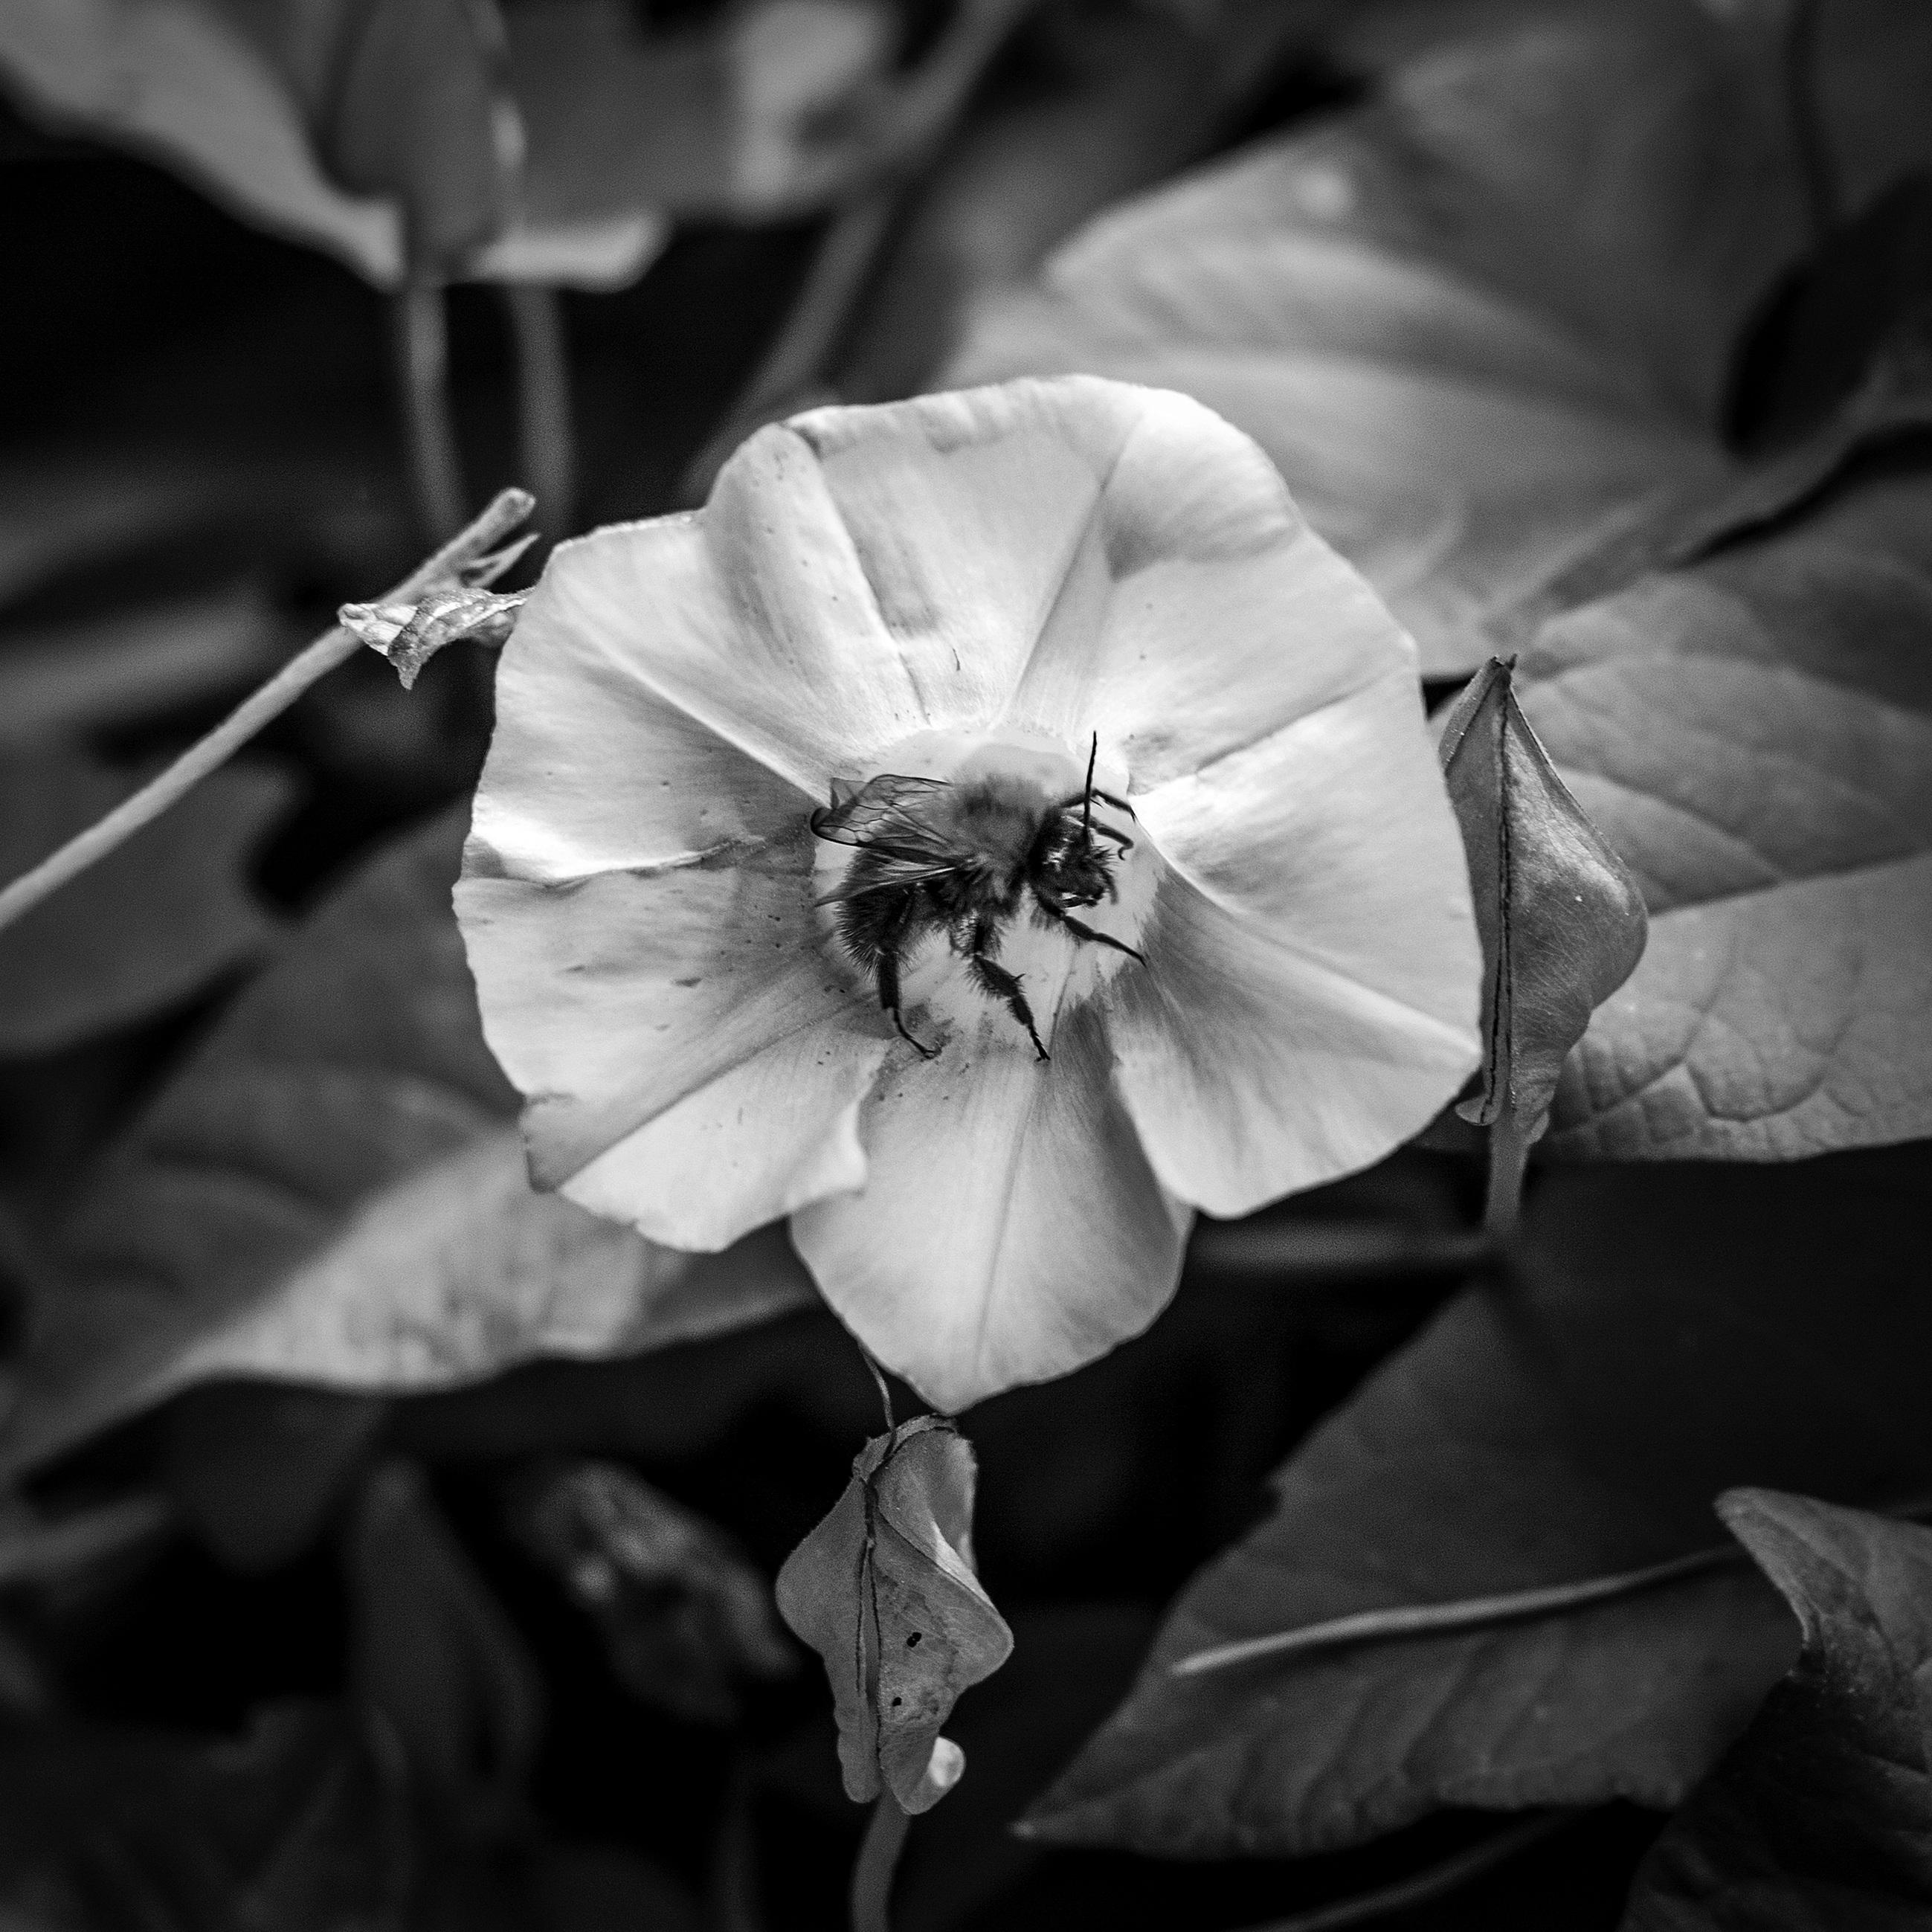 Free Images Nature Blossom Black And White Leaf Flower Petal